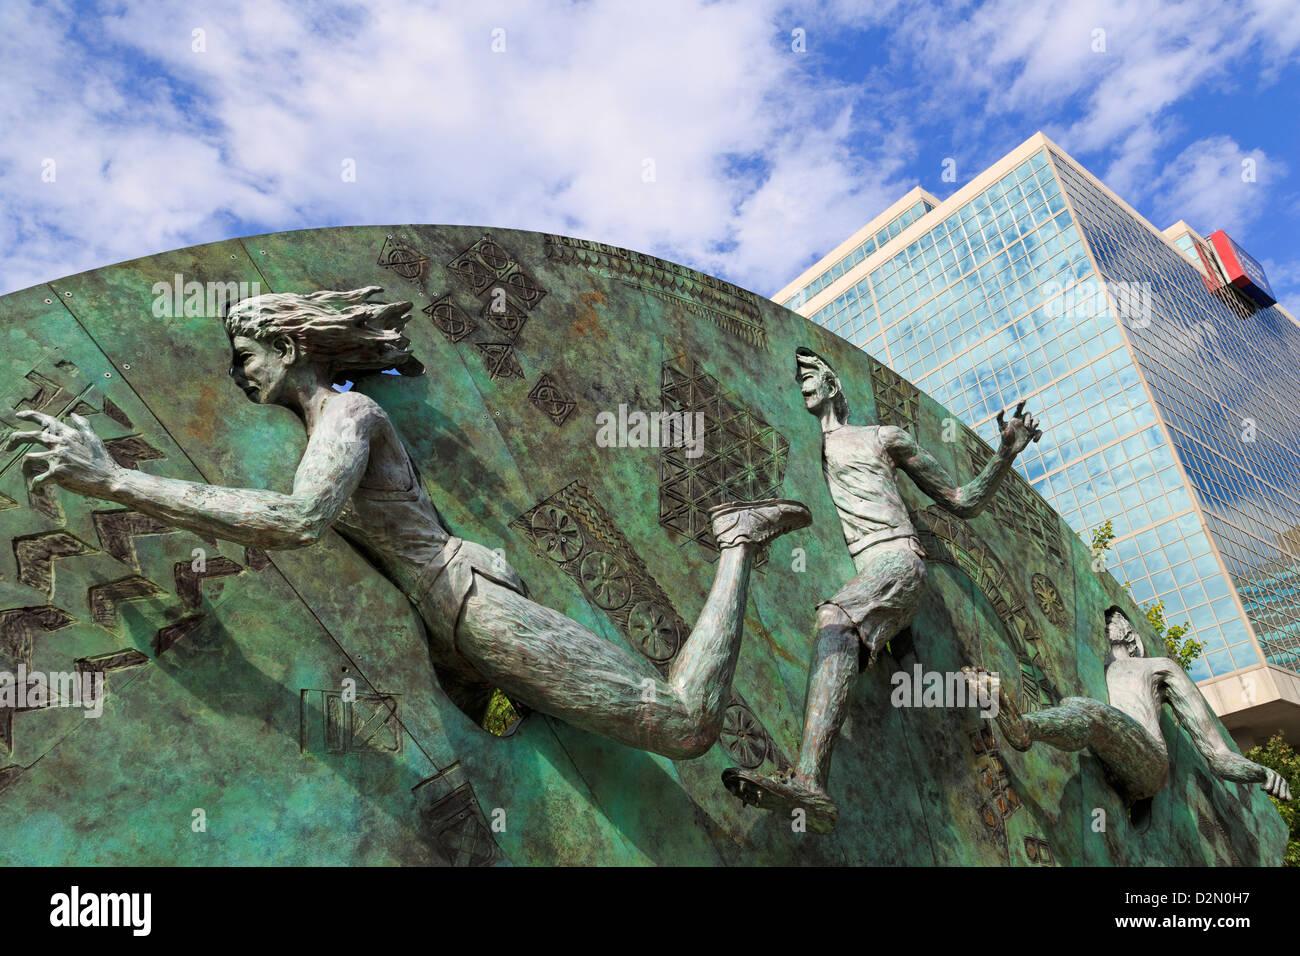 Tribut-Skulptur von P. Greer, Centennial Olympic Park, Atlanta, Georgia, Vereinigte Staaten von Amerika, Nordamerika Stockbild